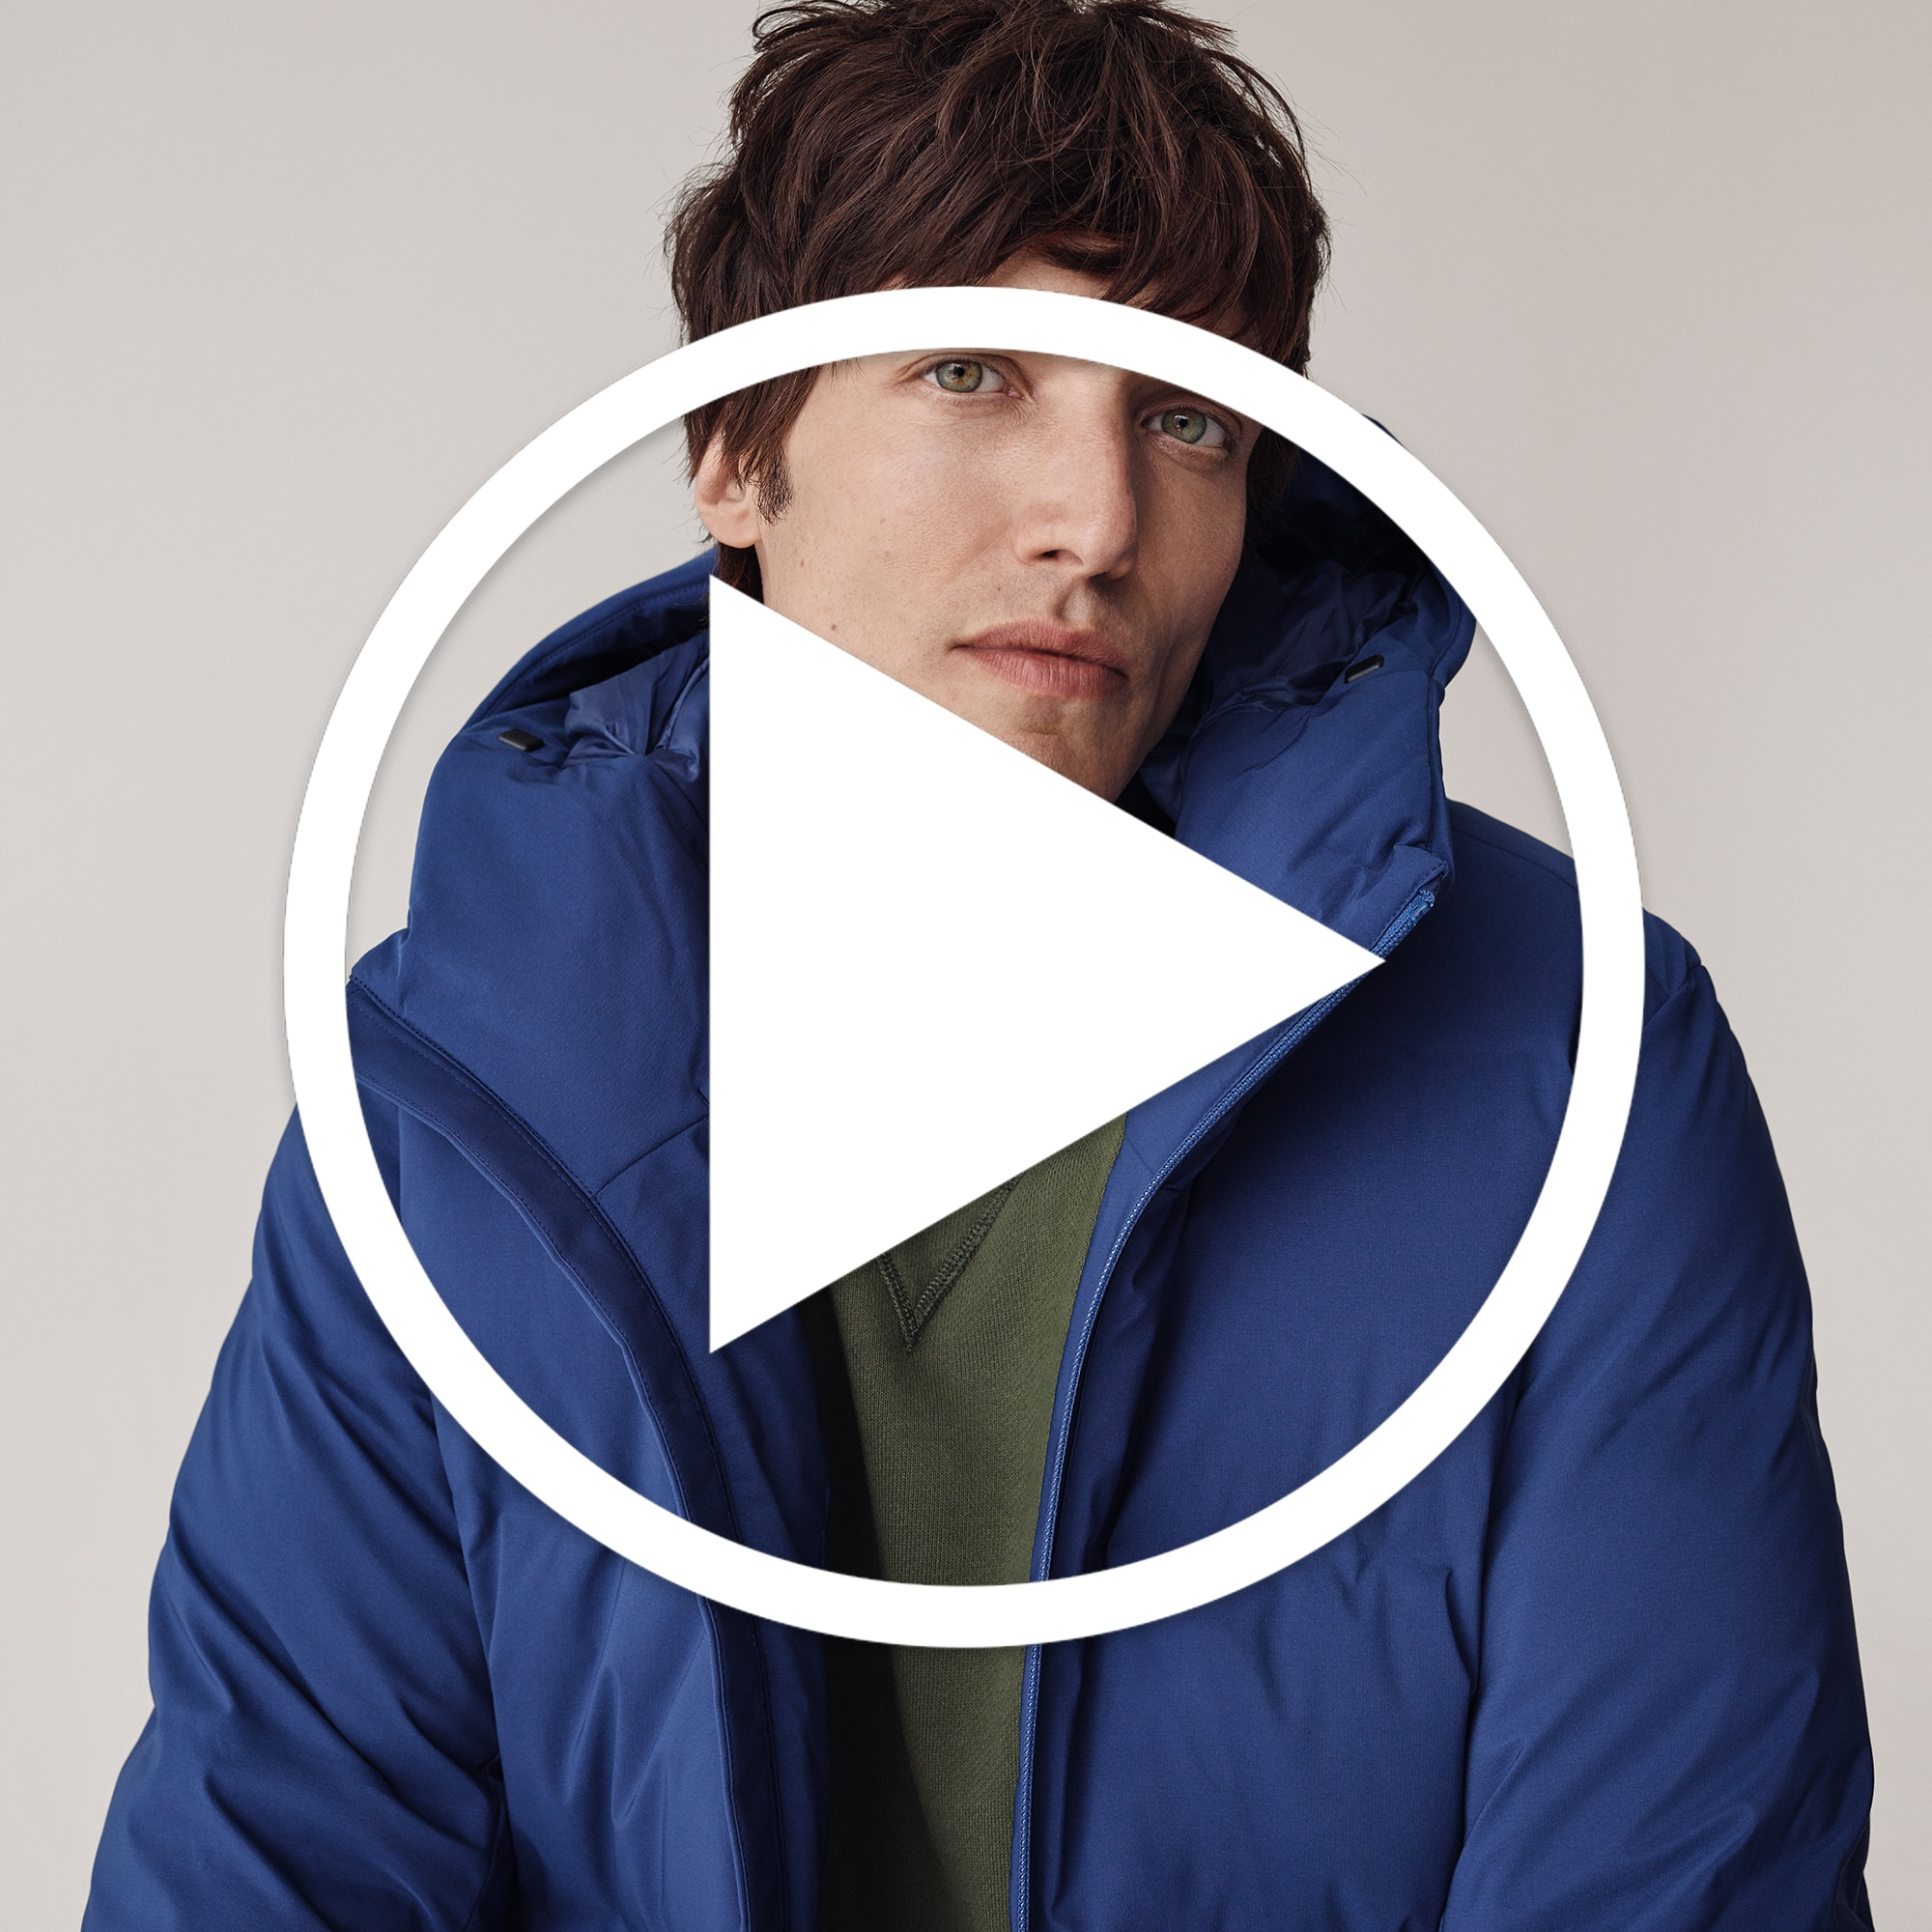 Educational Video: Men Seamless Down Parka, Blue, Small